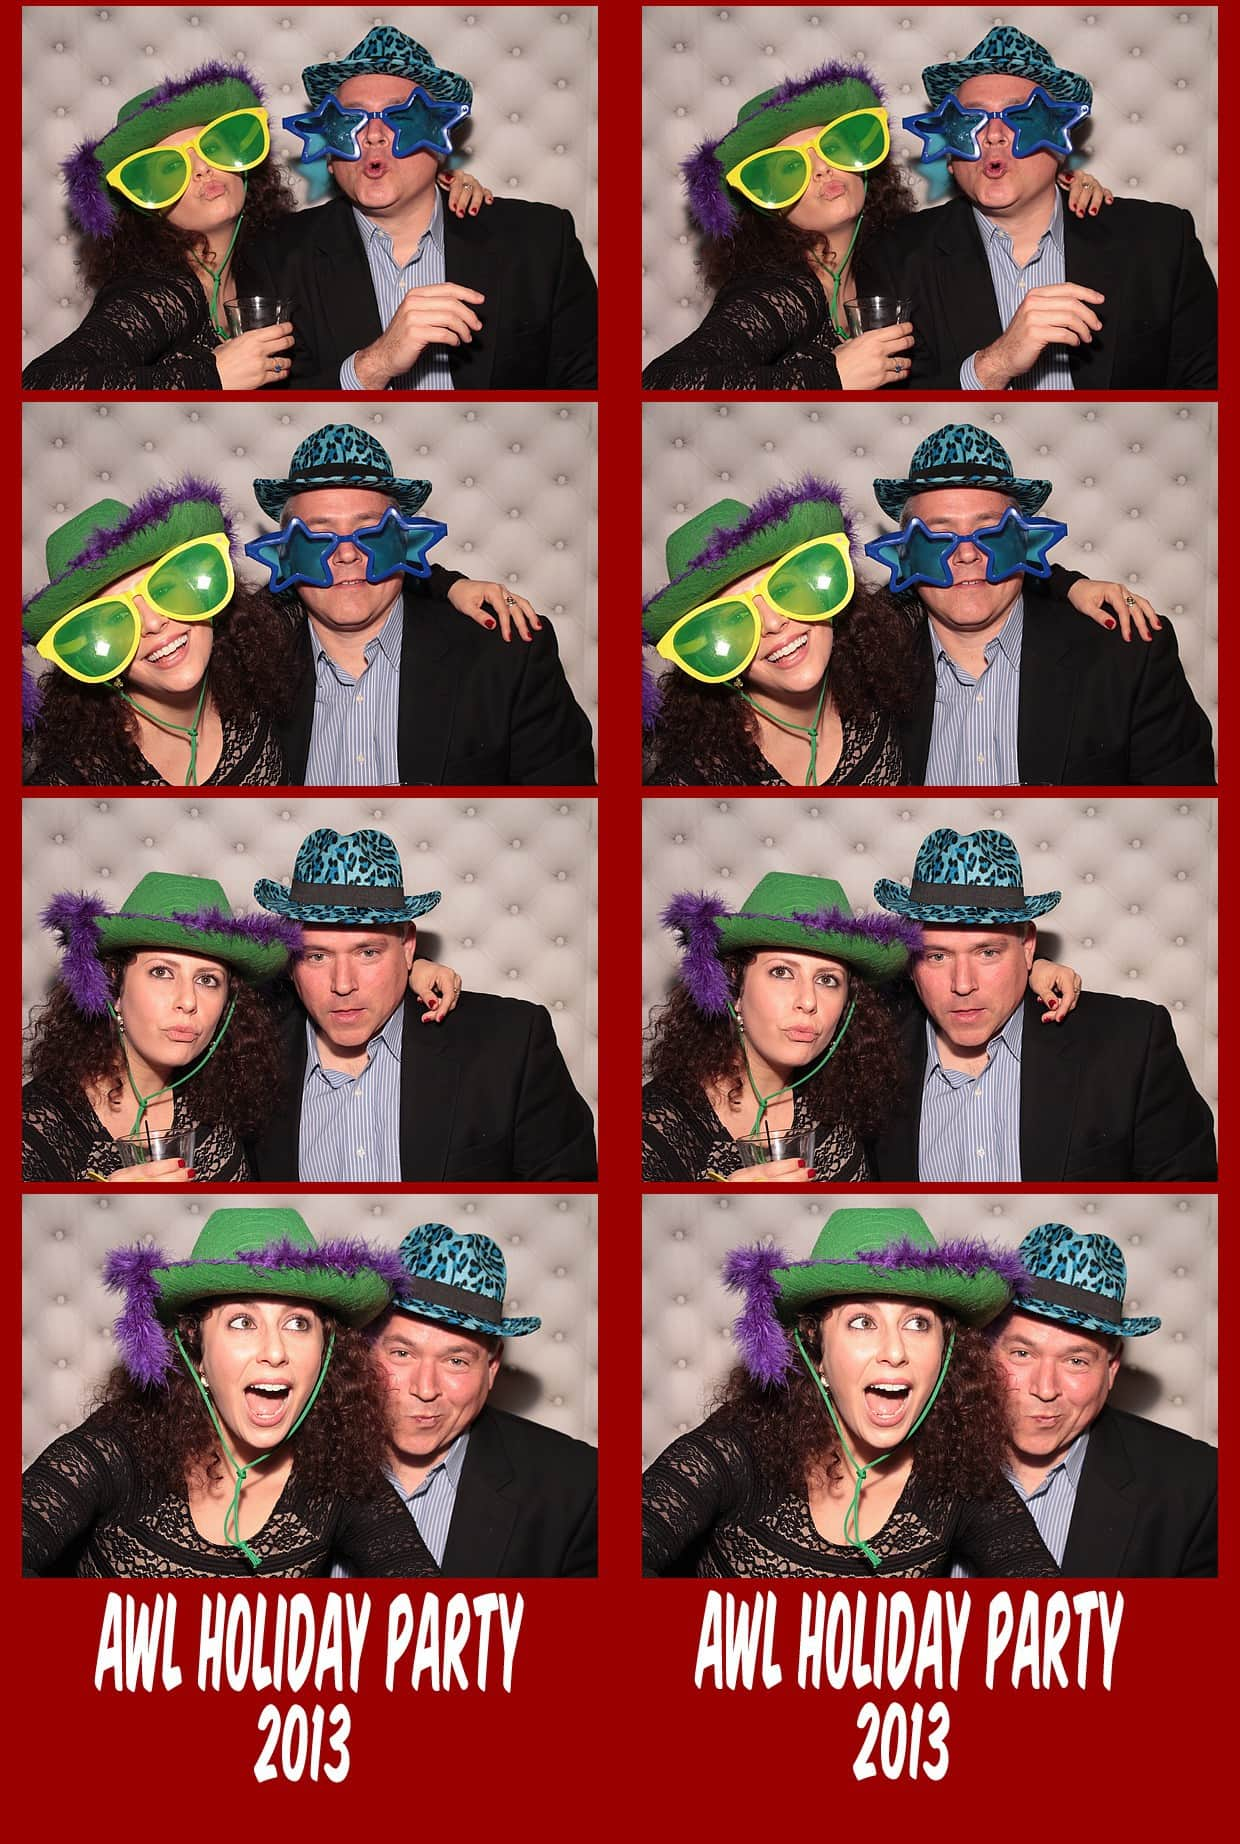 Photobooth-Austin-Rental-Party-Company-Holiday-Christmas-No. 1-Memories-Fun-Props